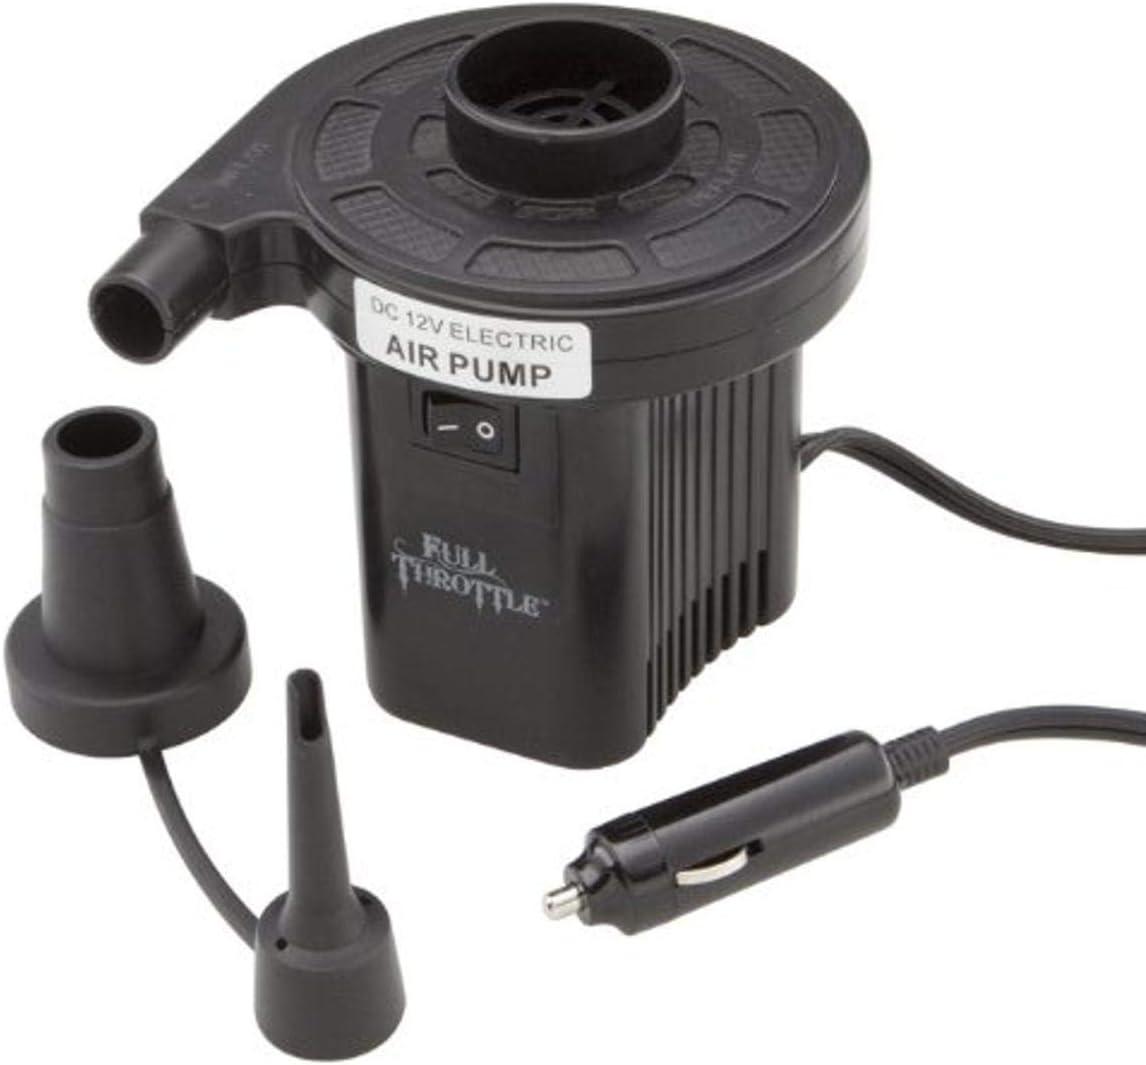 Absolute Outdoor Full Throttle Compact 12V Cigarette Lighter Air Pump (Black)